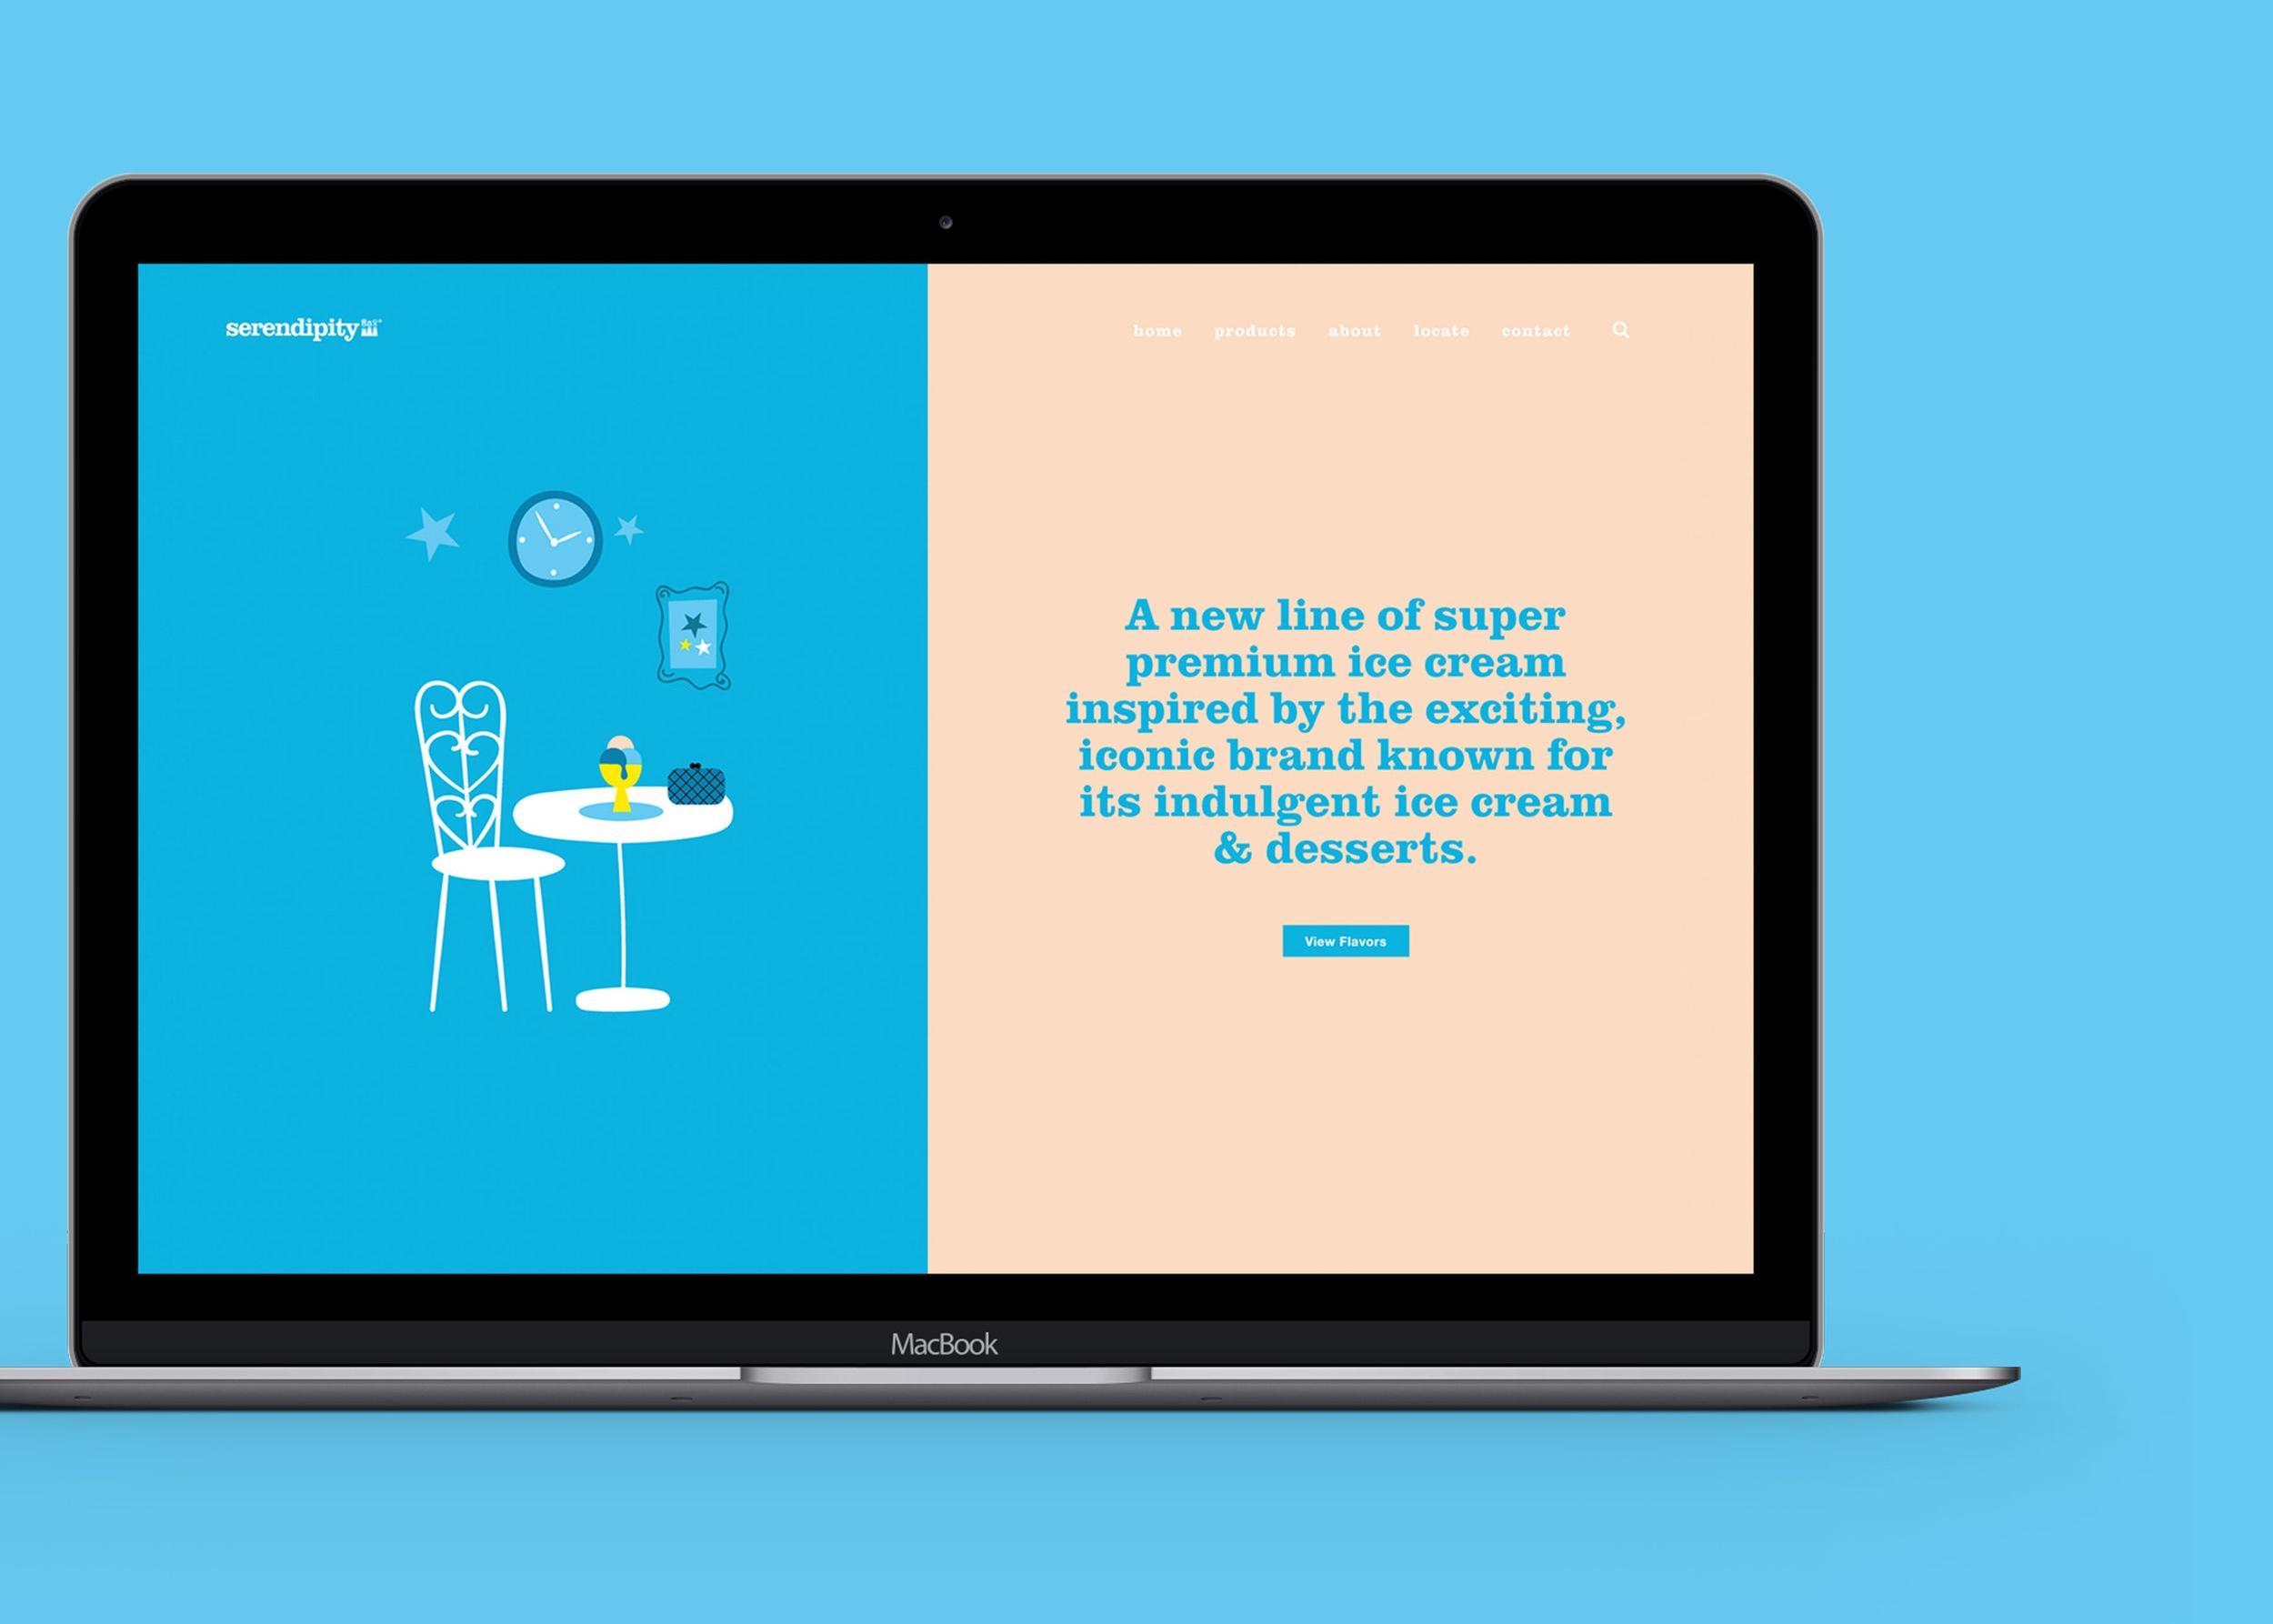 James-Rivas_Serendipity-Ice-Cream_laptop_website.jpg